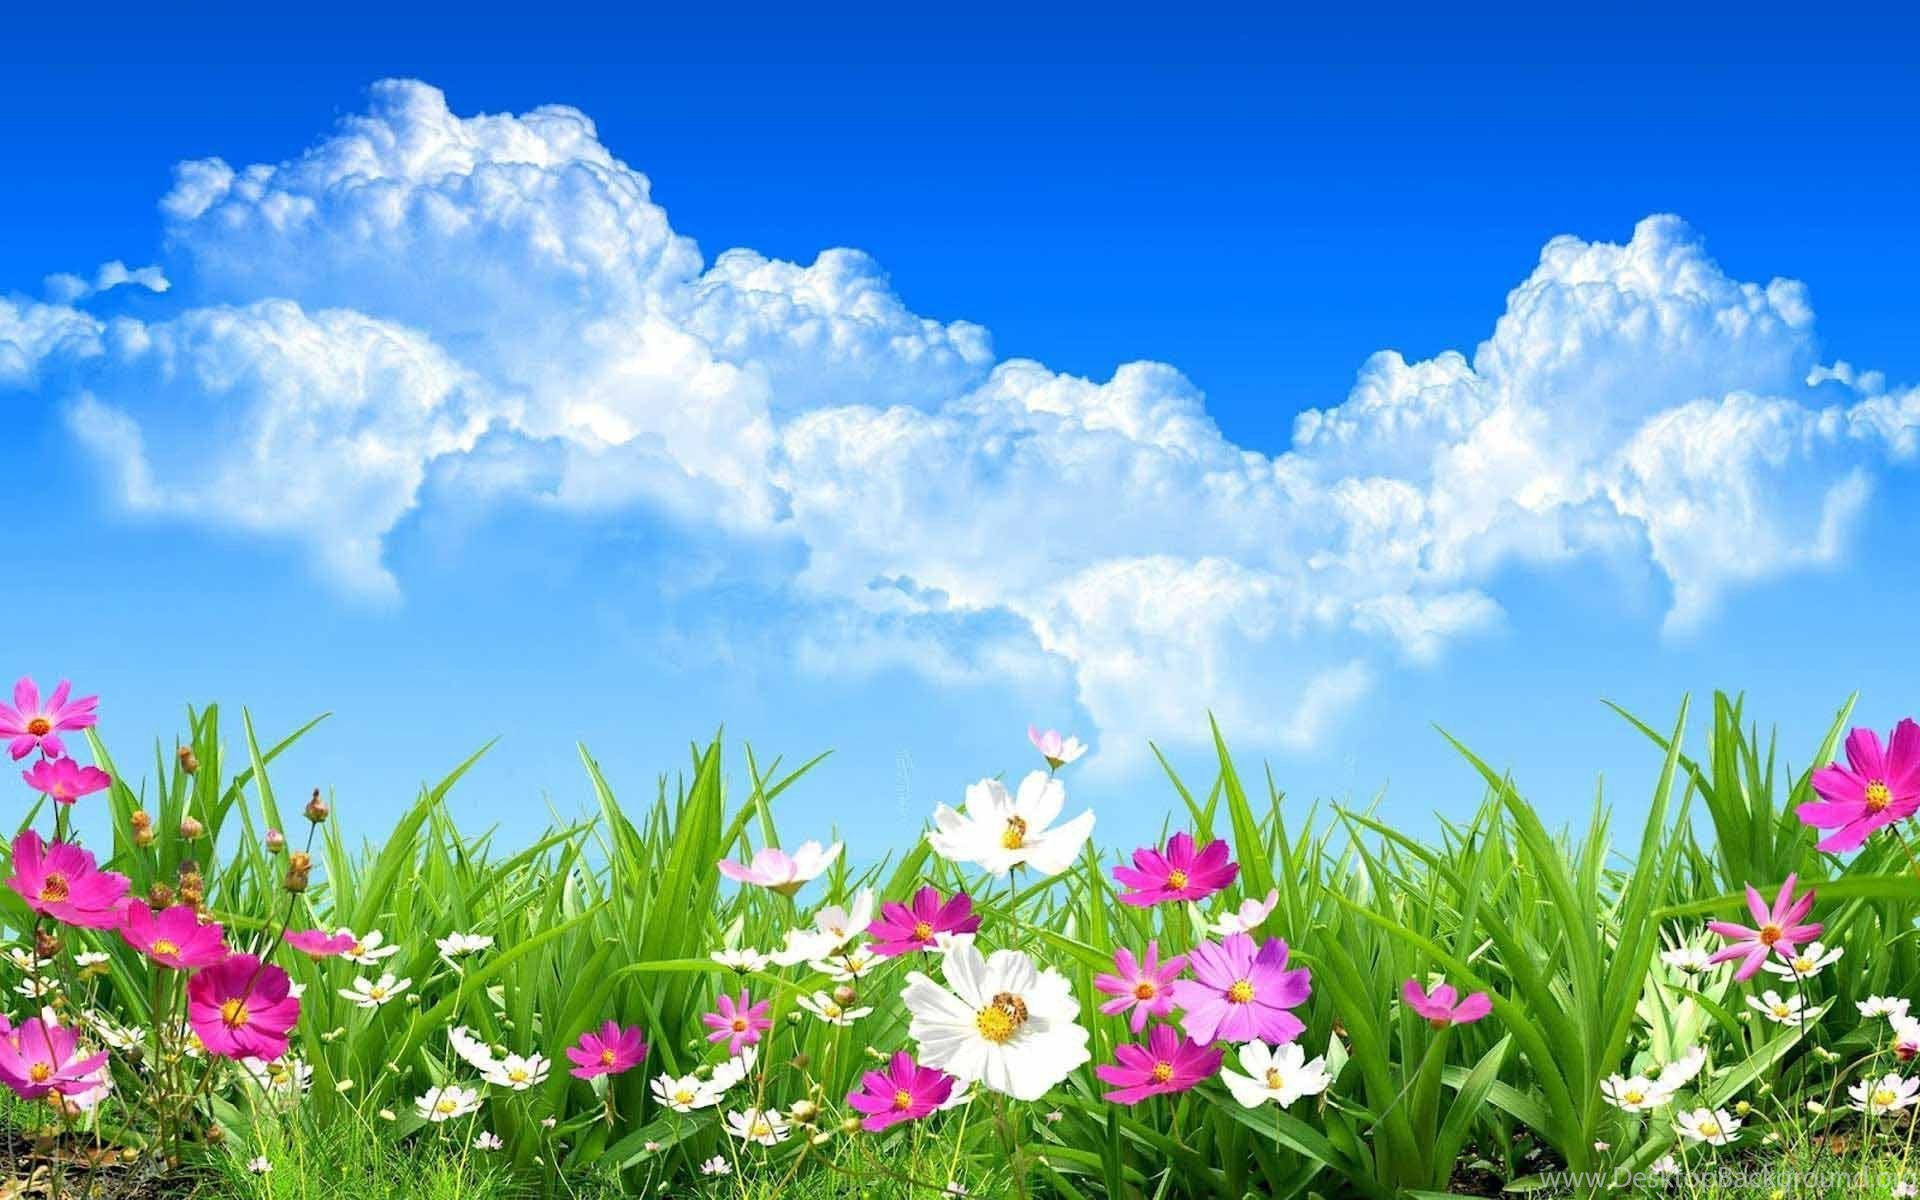 Wild Spring Flowers Wallpapers Hd Download Of Spring Day Desktop